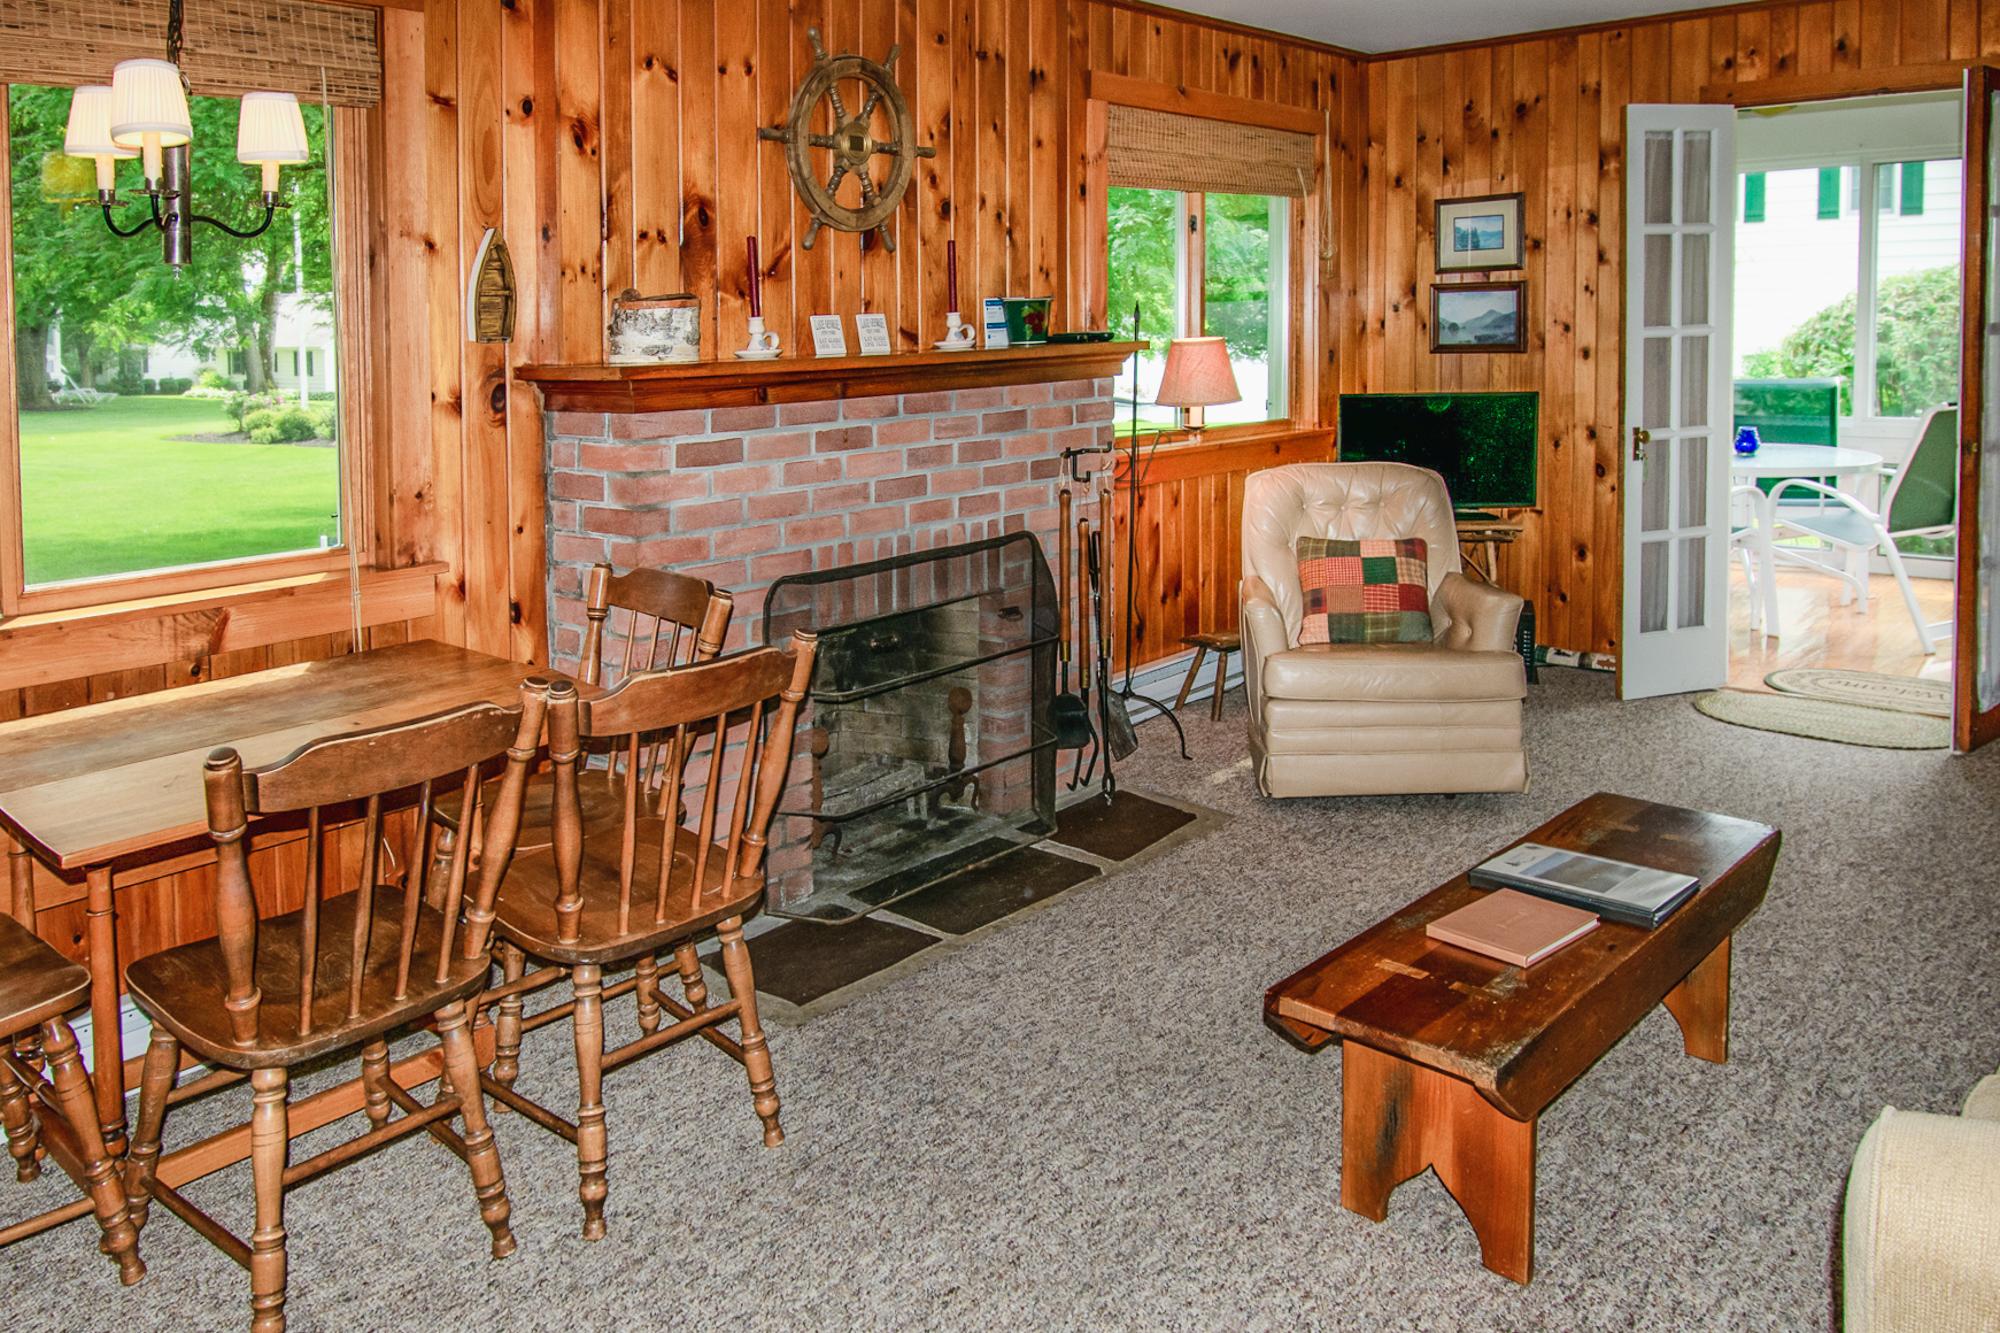 Takundewide Cottage #11 livroom fireplaceJul2019DSC_0395